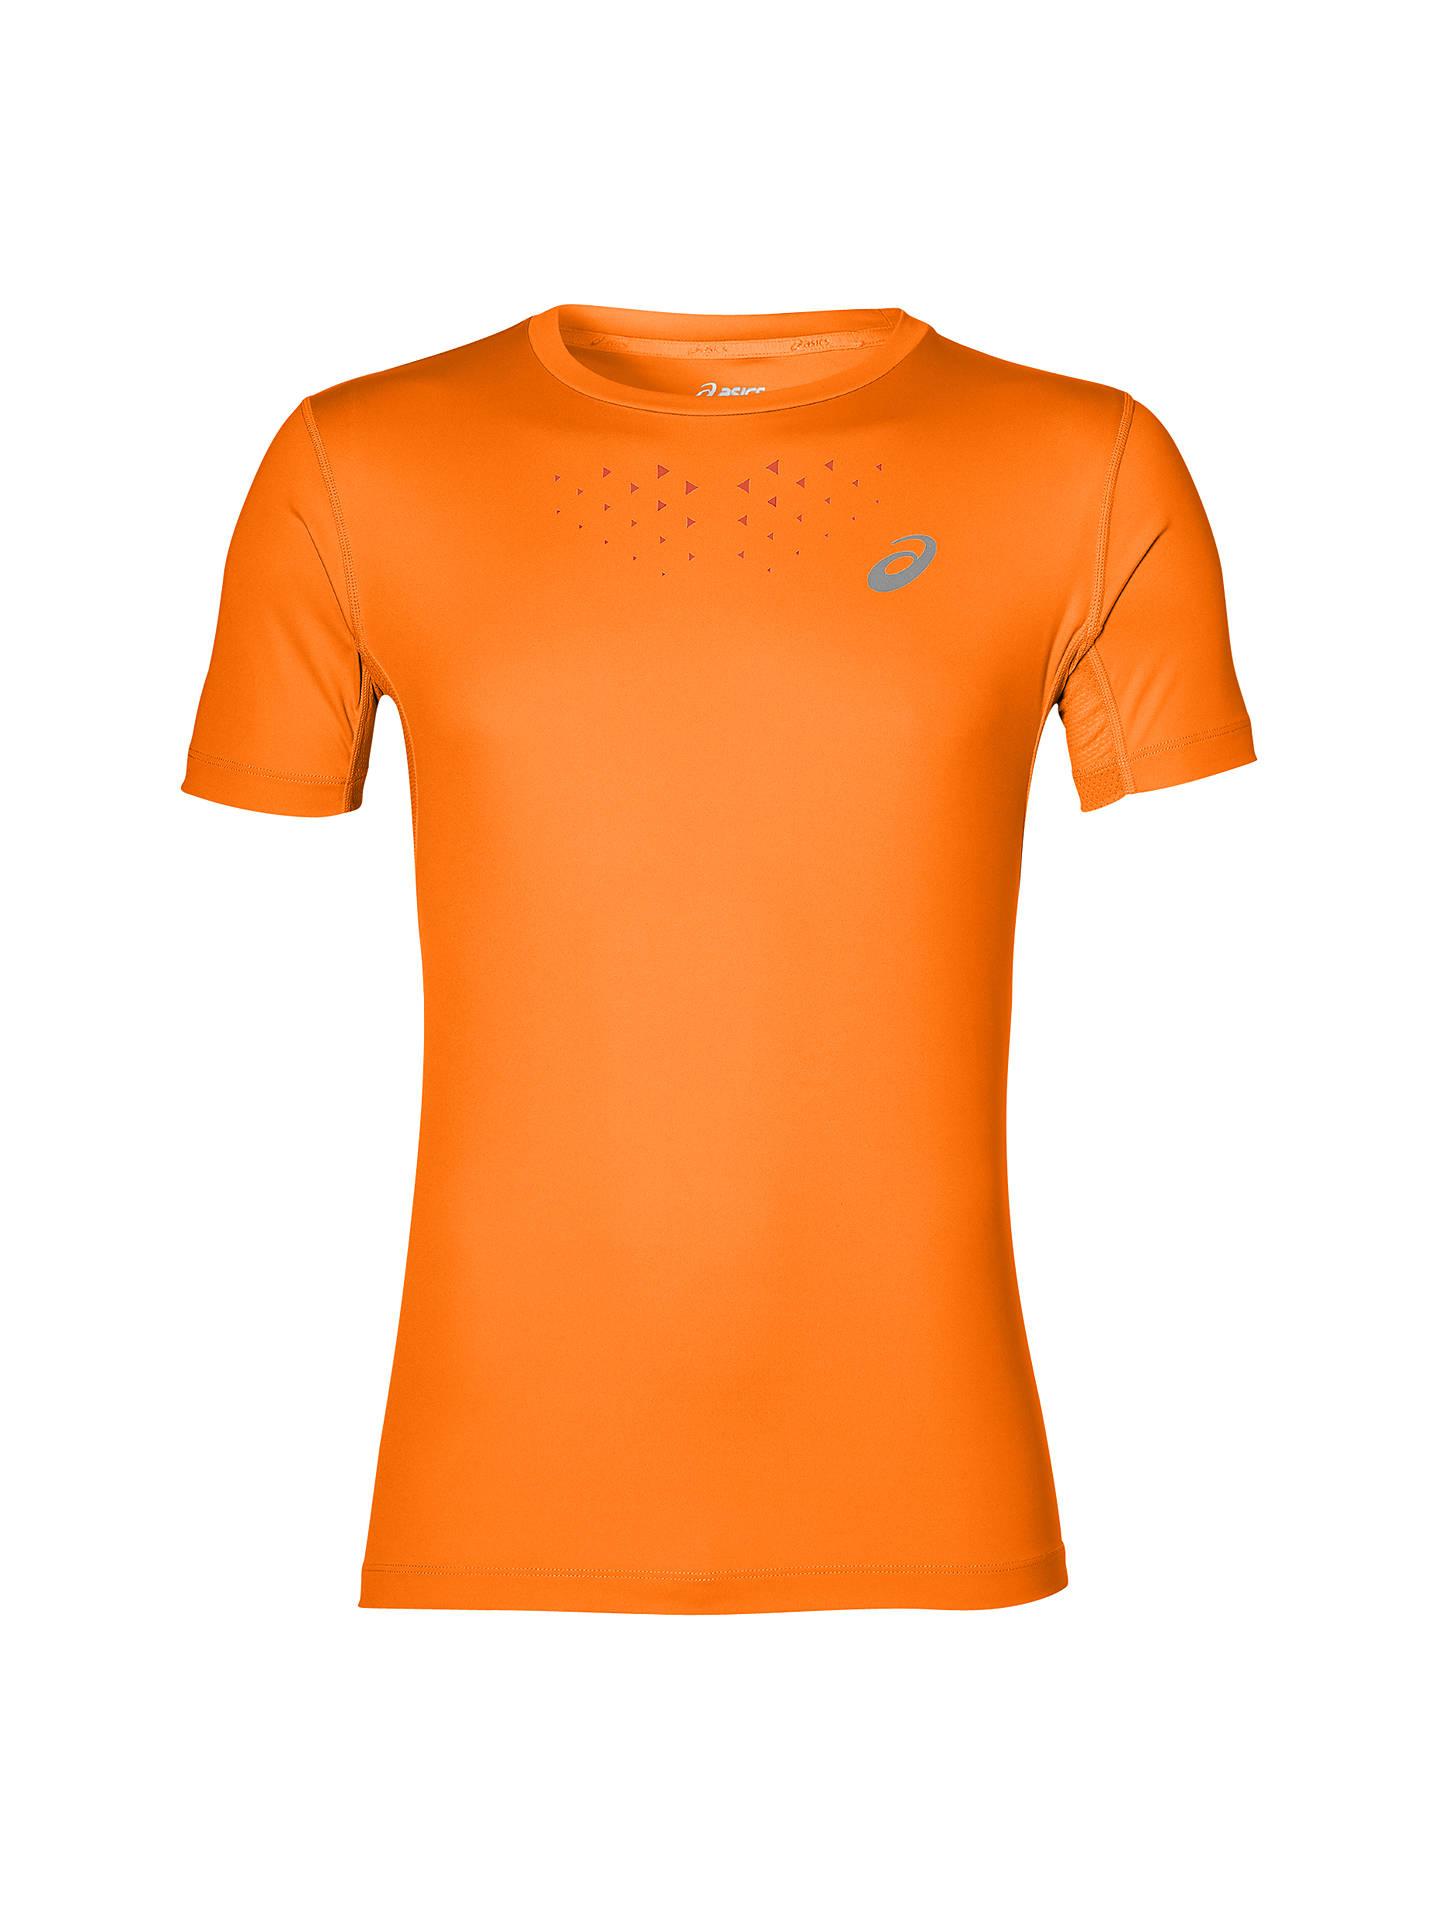 asics orange shirt